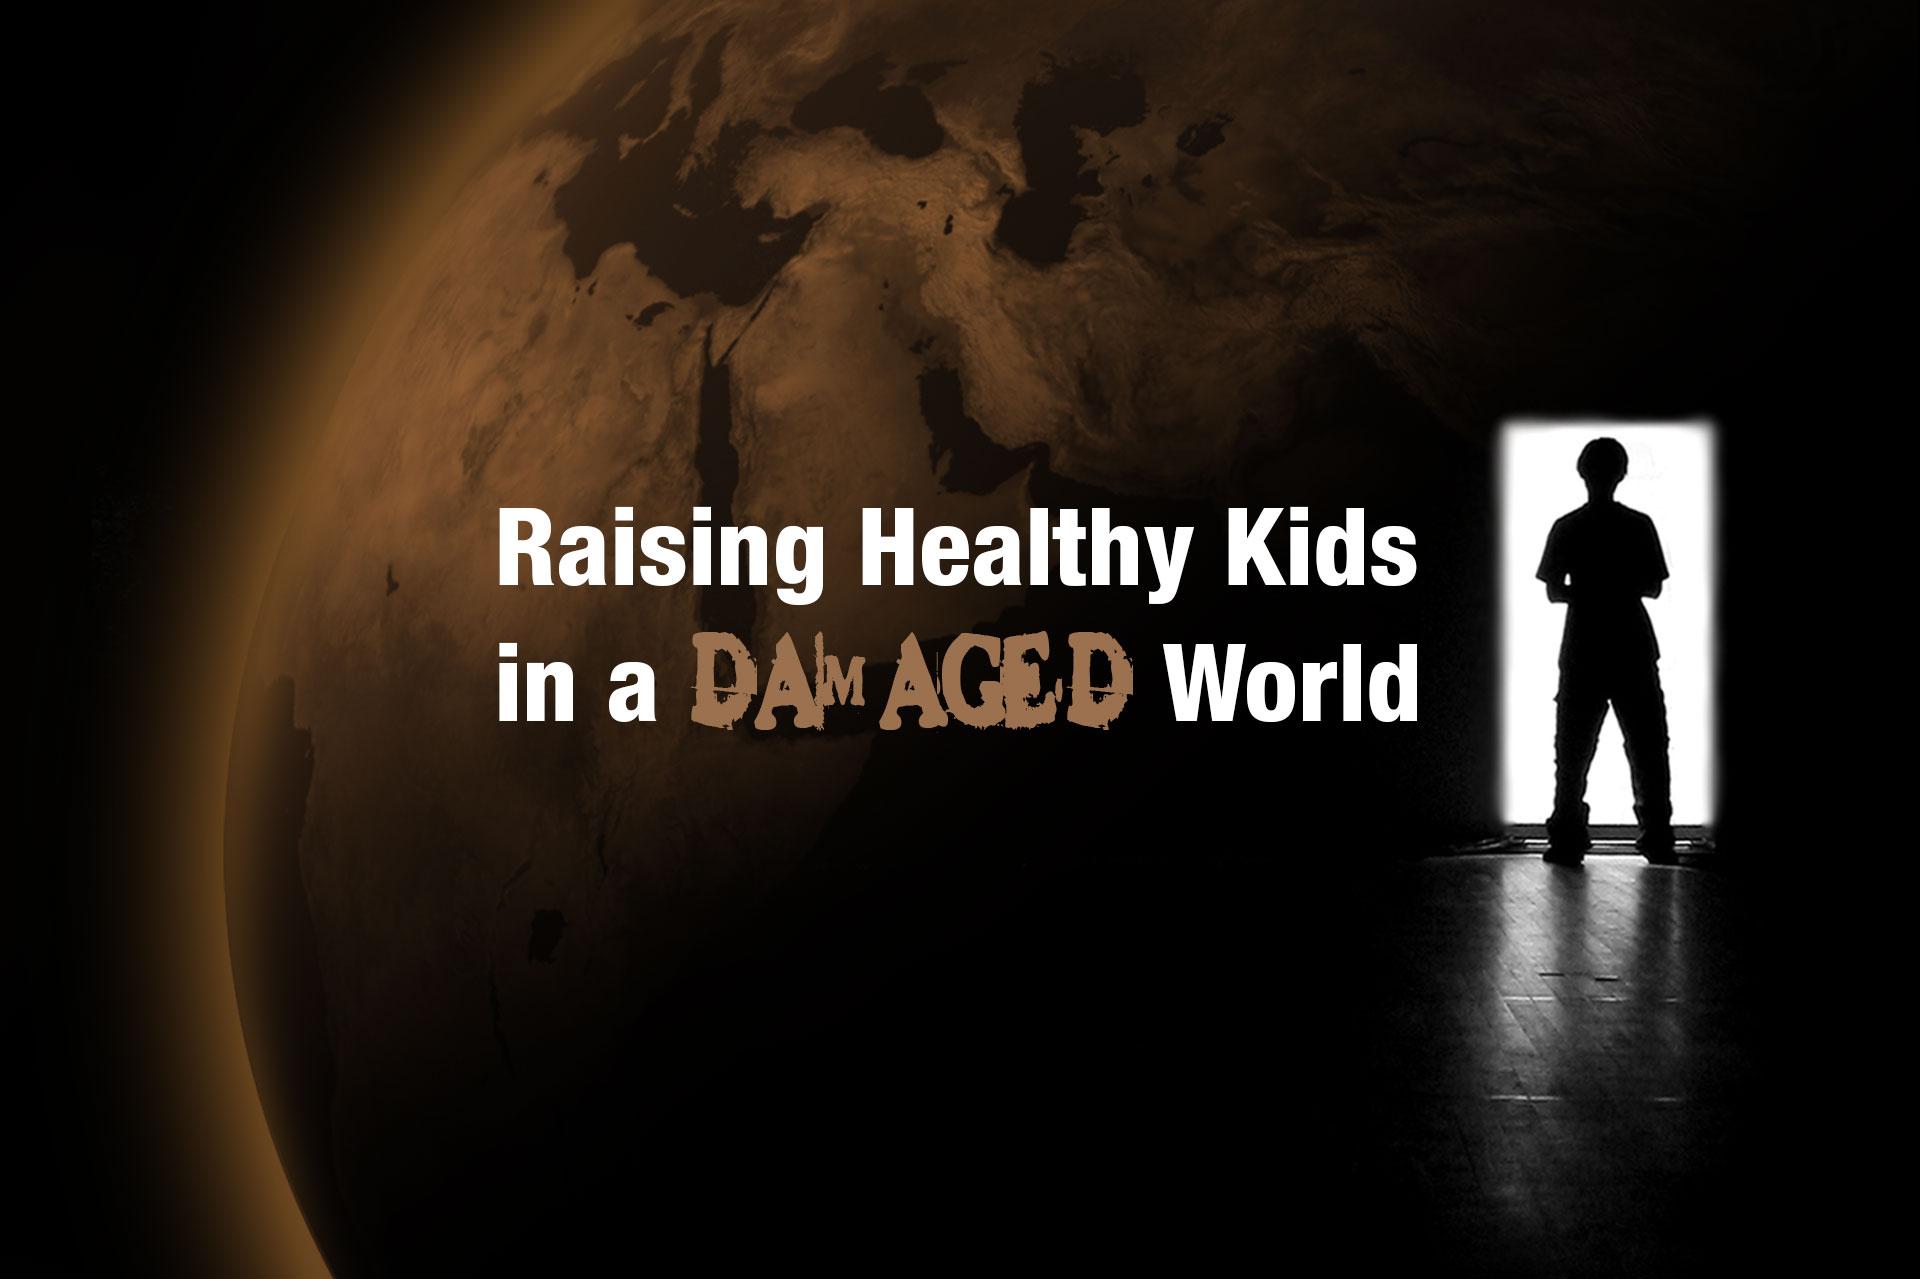 Raising Healthy Kids in a Damaged World